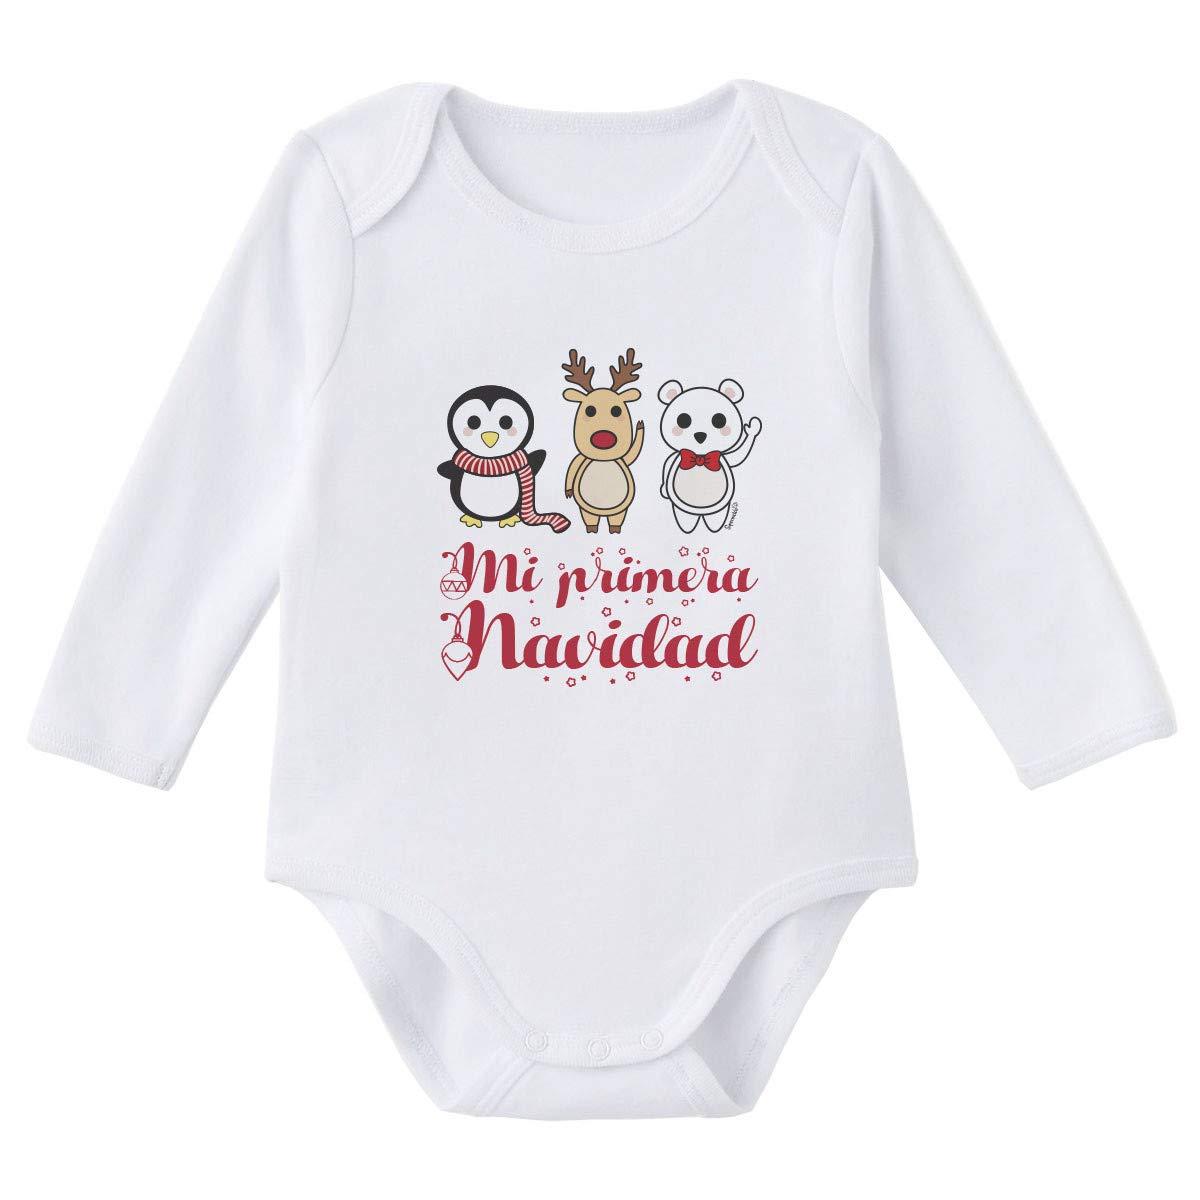 SUPERMOLON Body beb/é manga larga Mi primera Navidad Blanco algod/ón para beb/é 0-3 meses